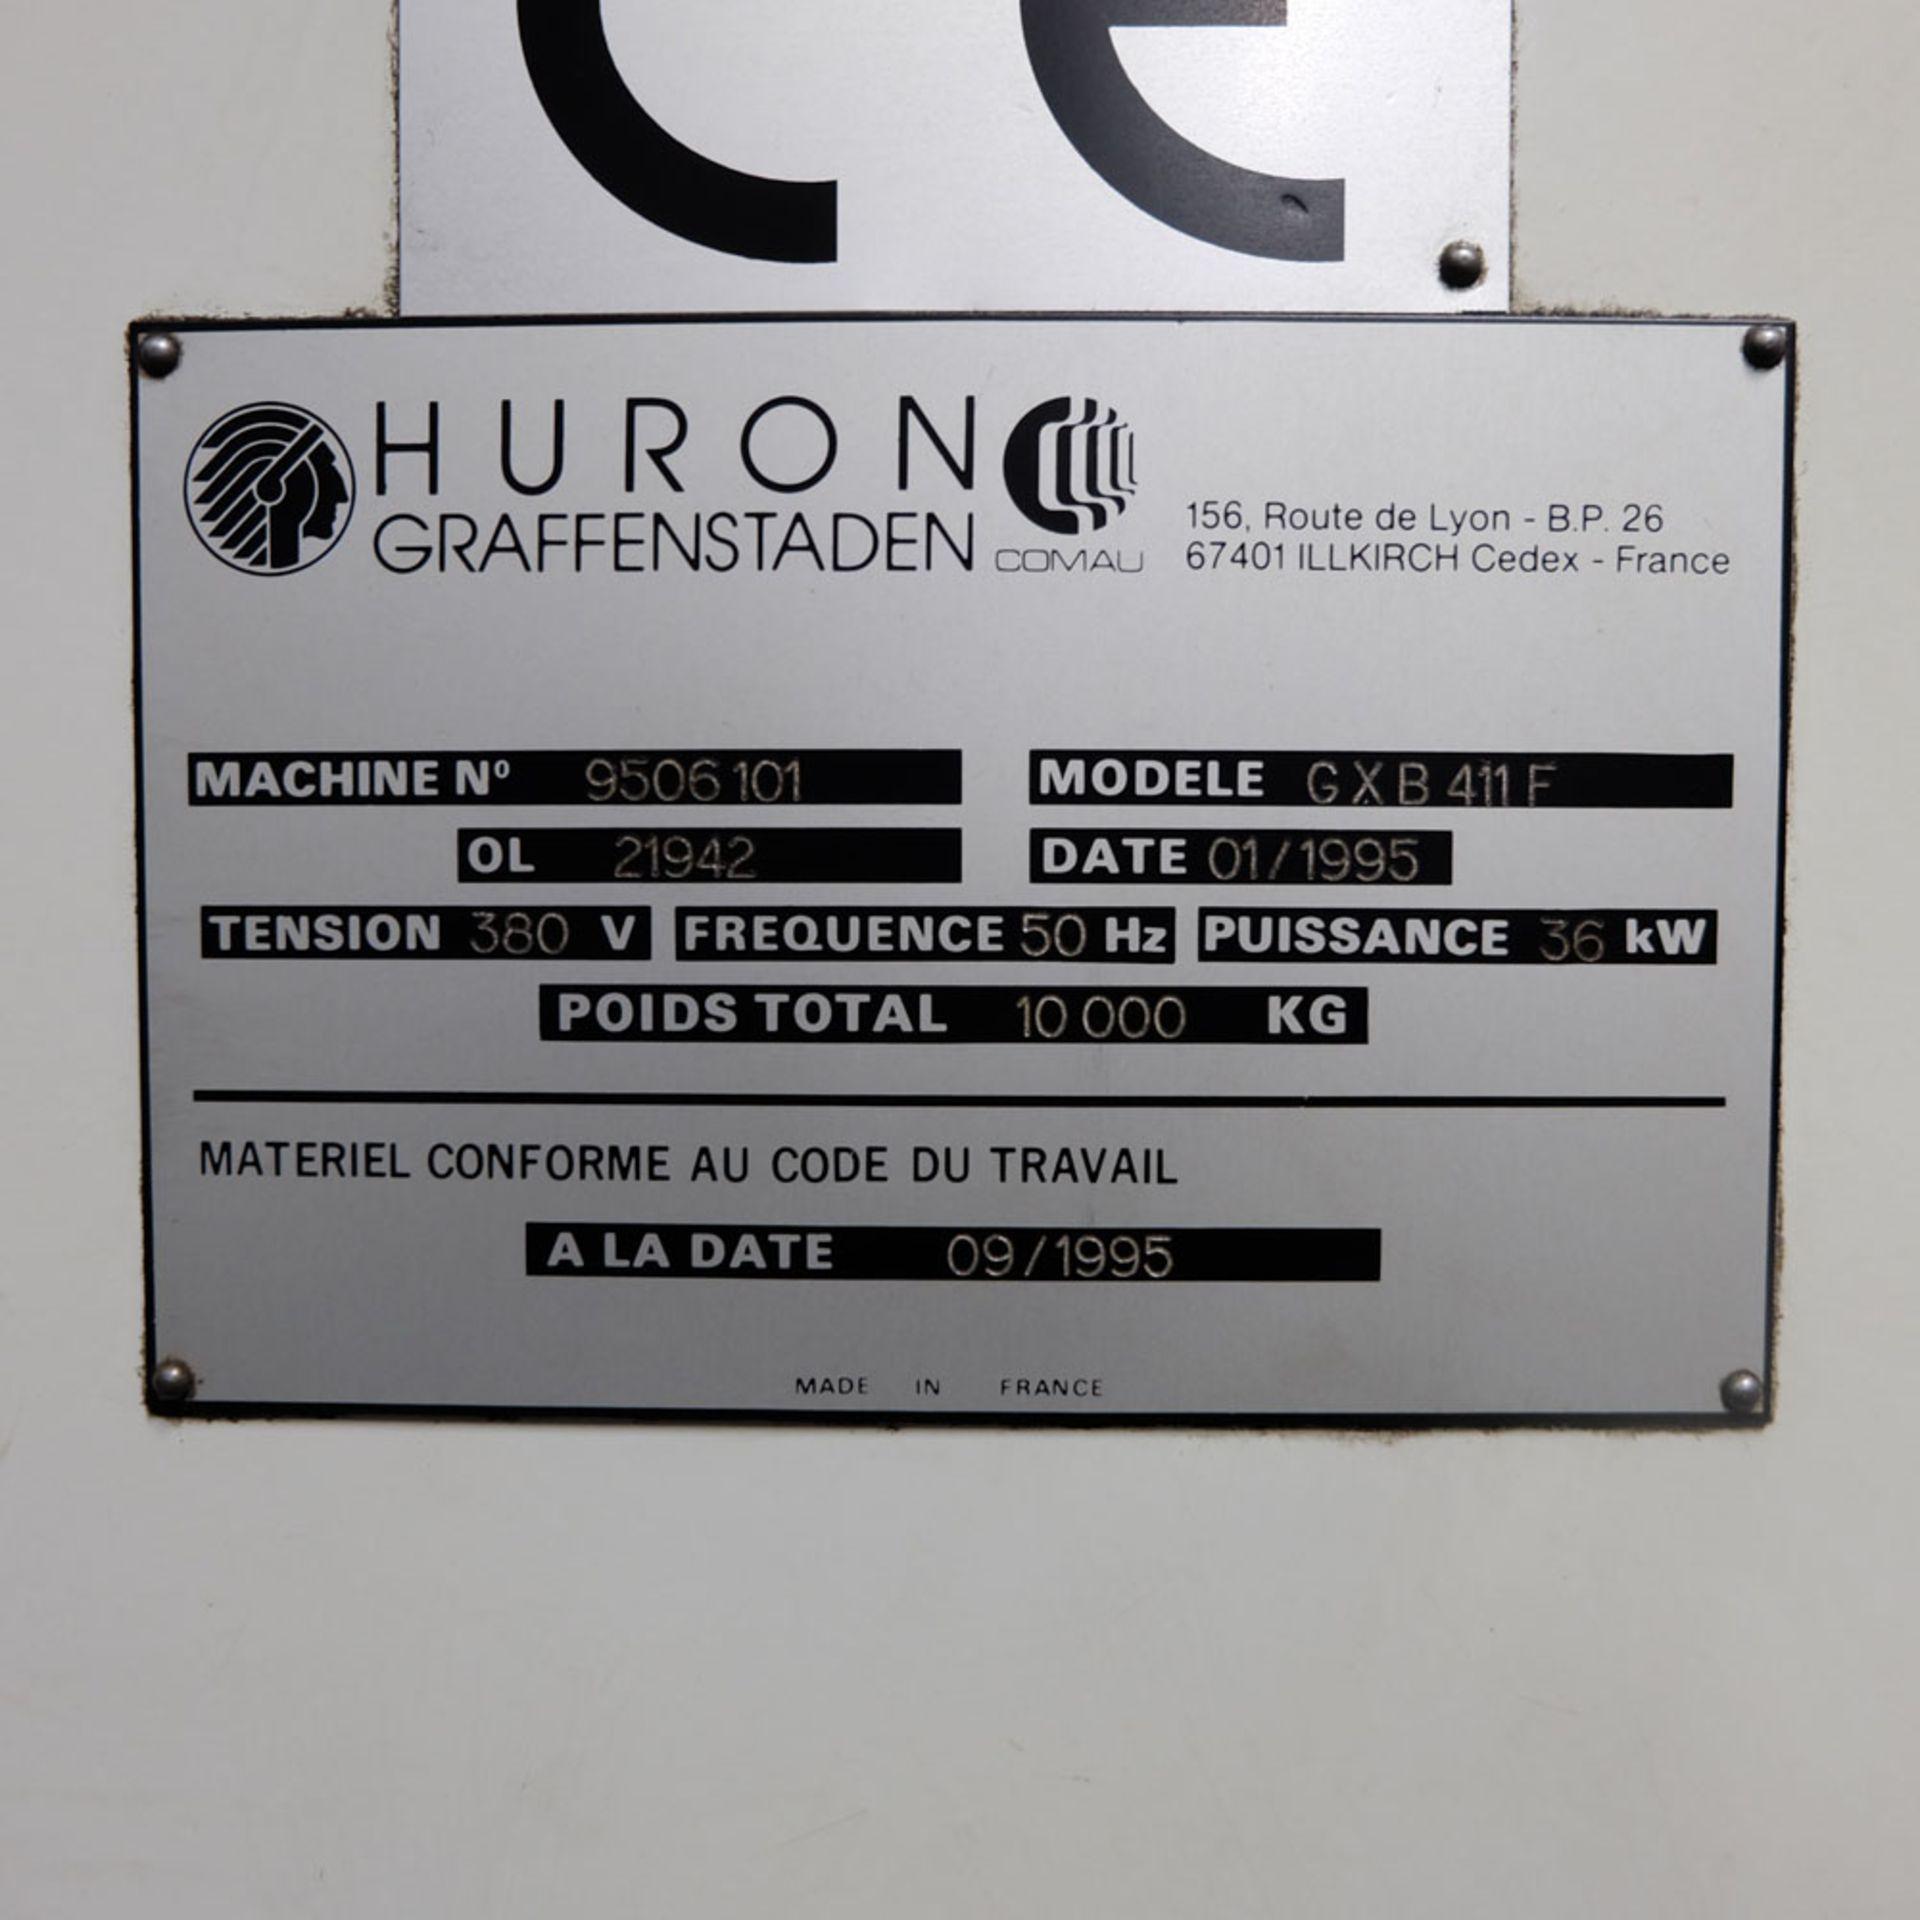 Huron GX 411 F Bed Type Milling Machine. Control Unit: CNC (HEIDENHAIN TNC 415B) - Image 10 of 12